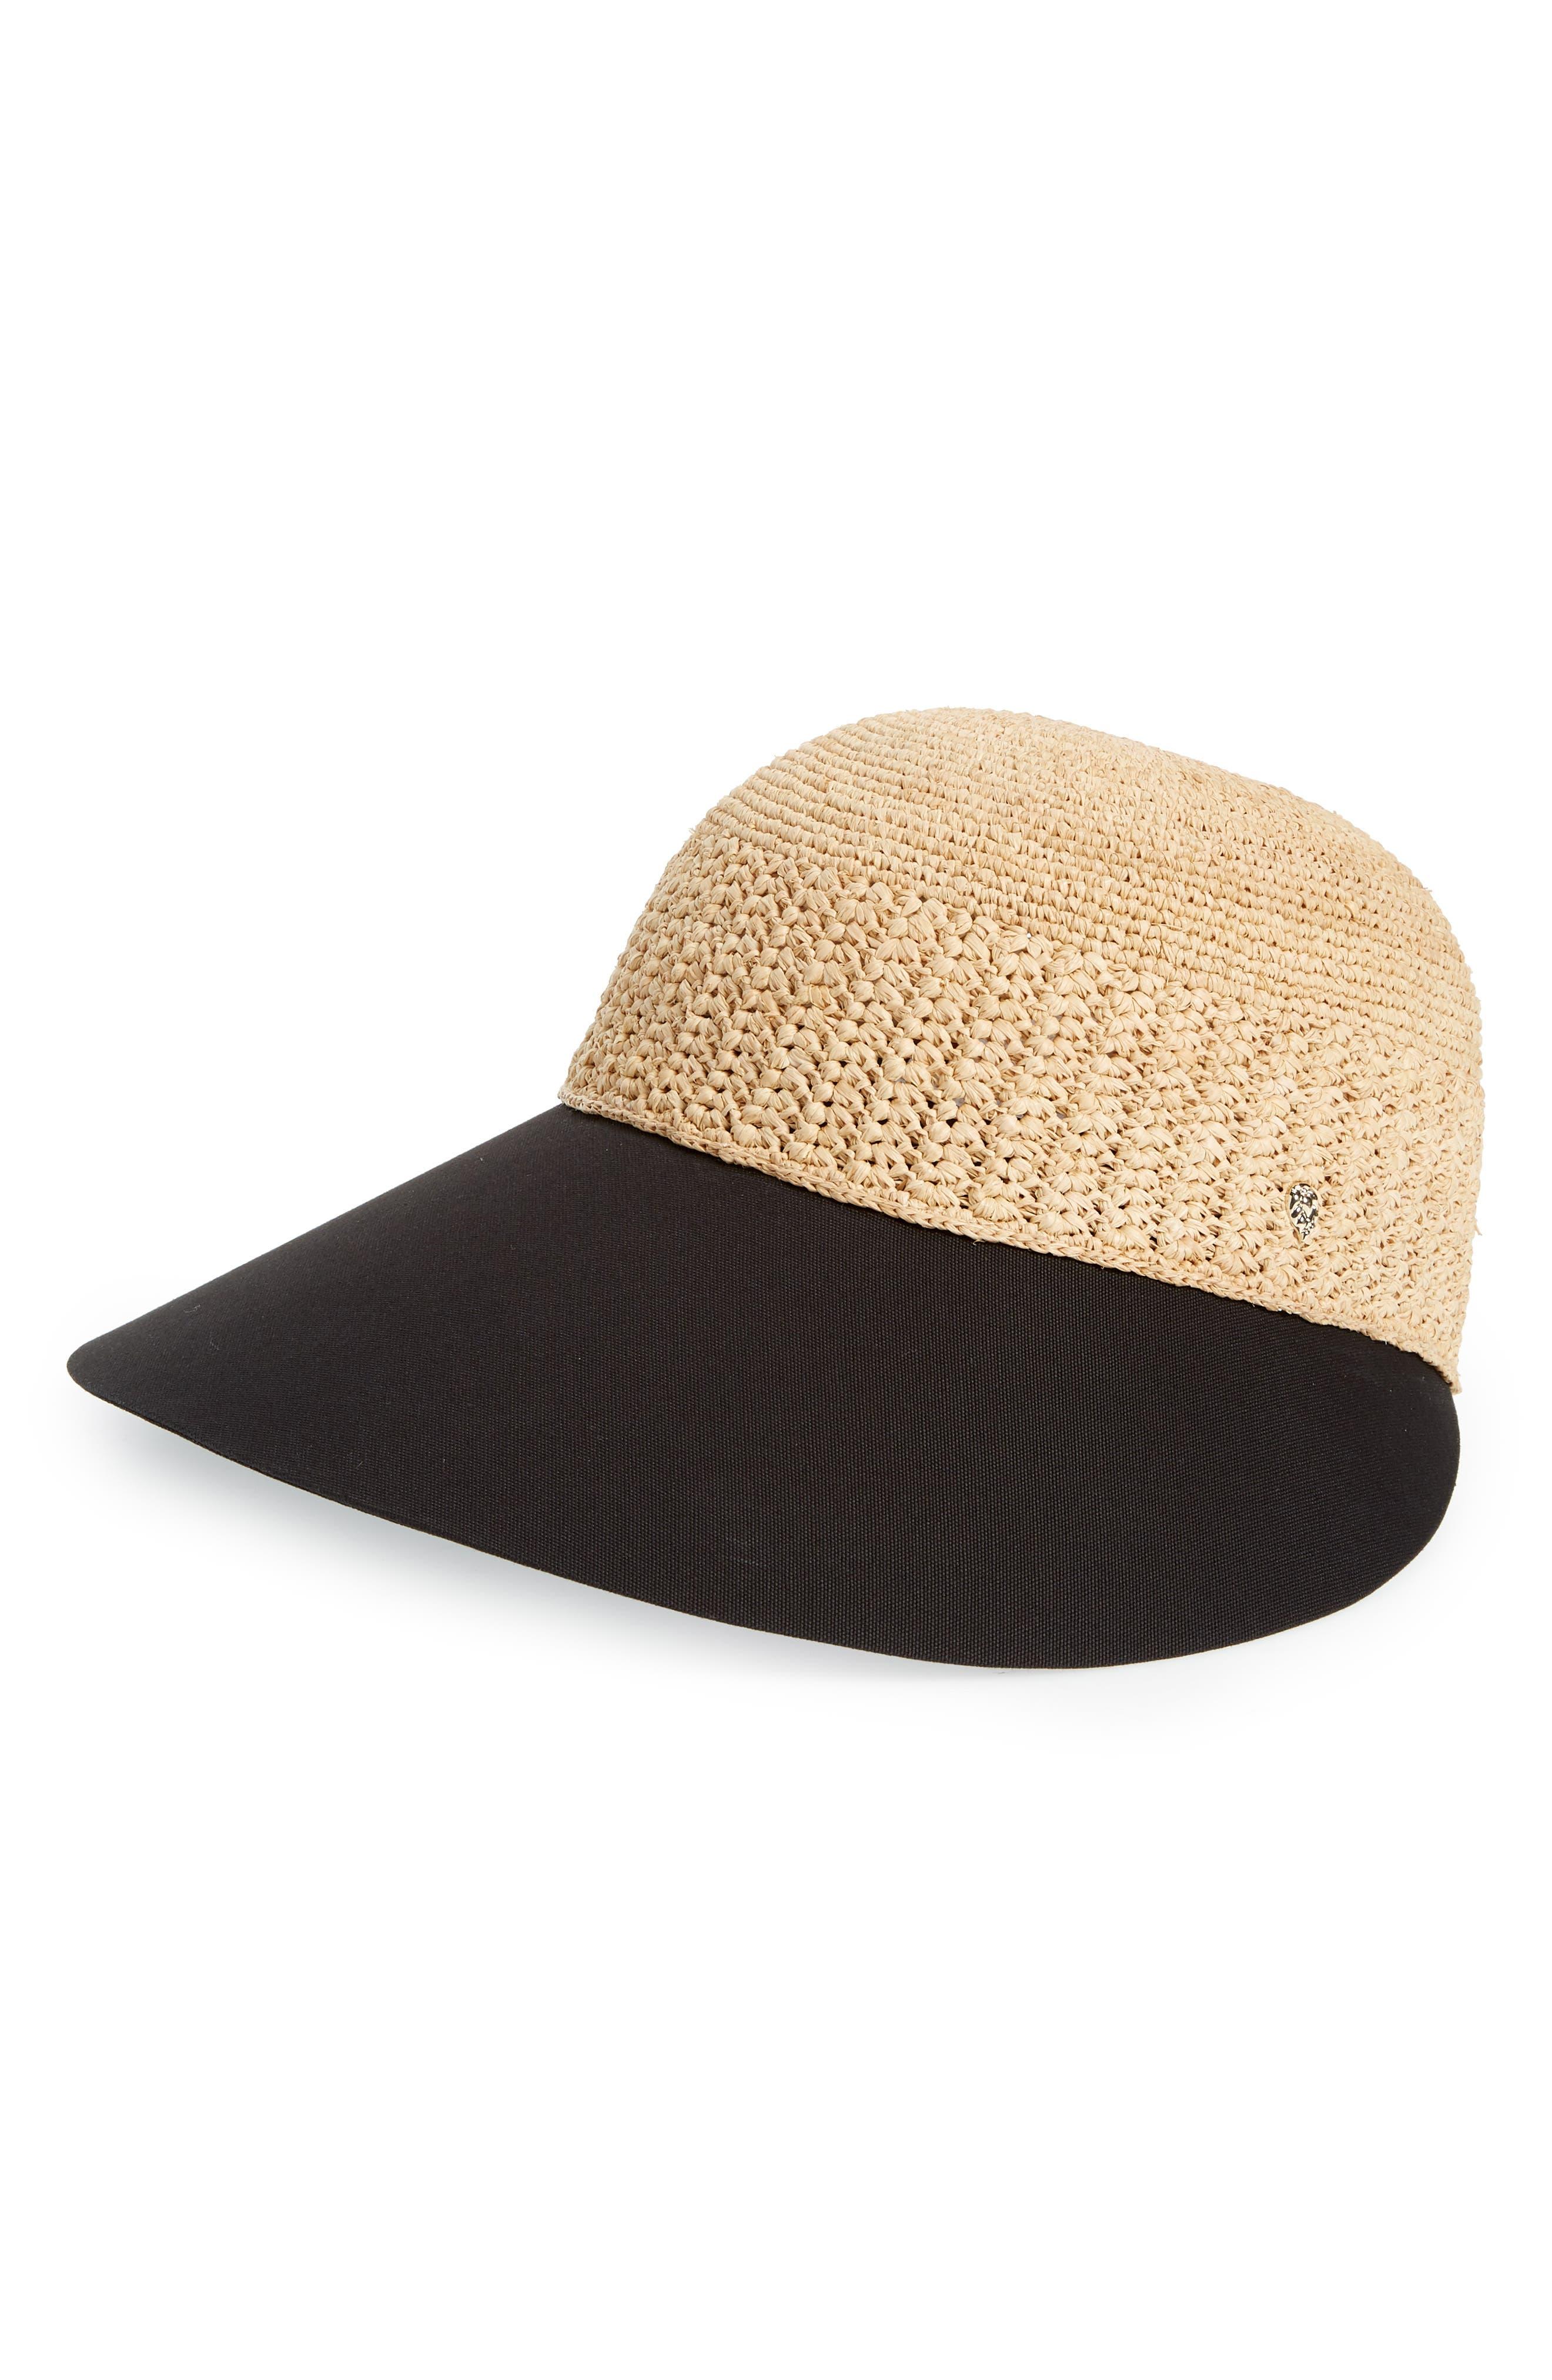 Wide Peak Raffia & Cotton Cap,                         Main,                         color, NATURAL/ BLACK